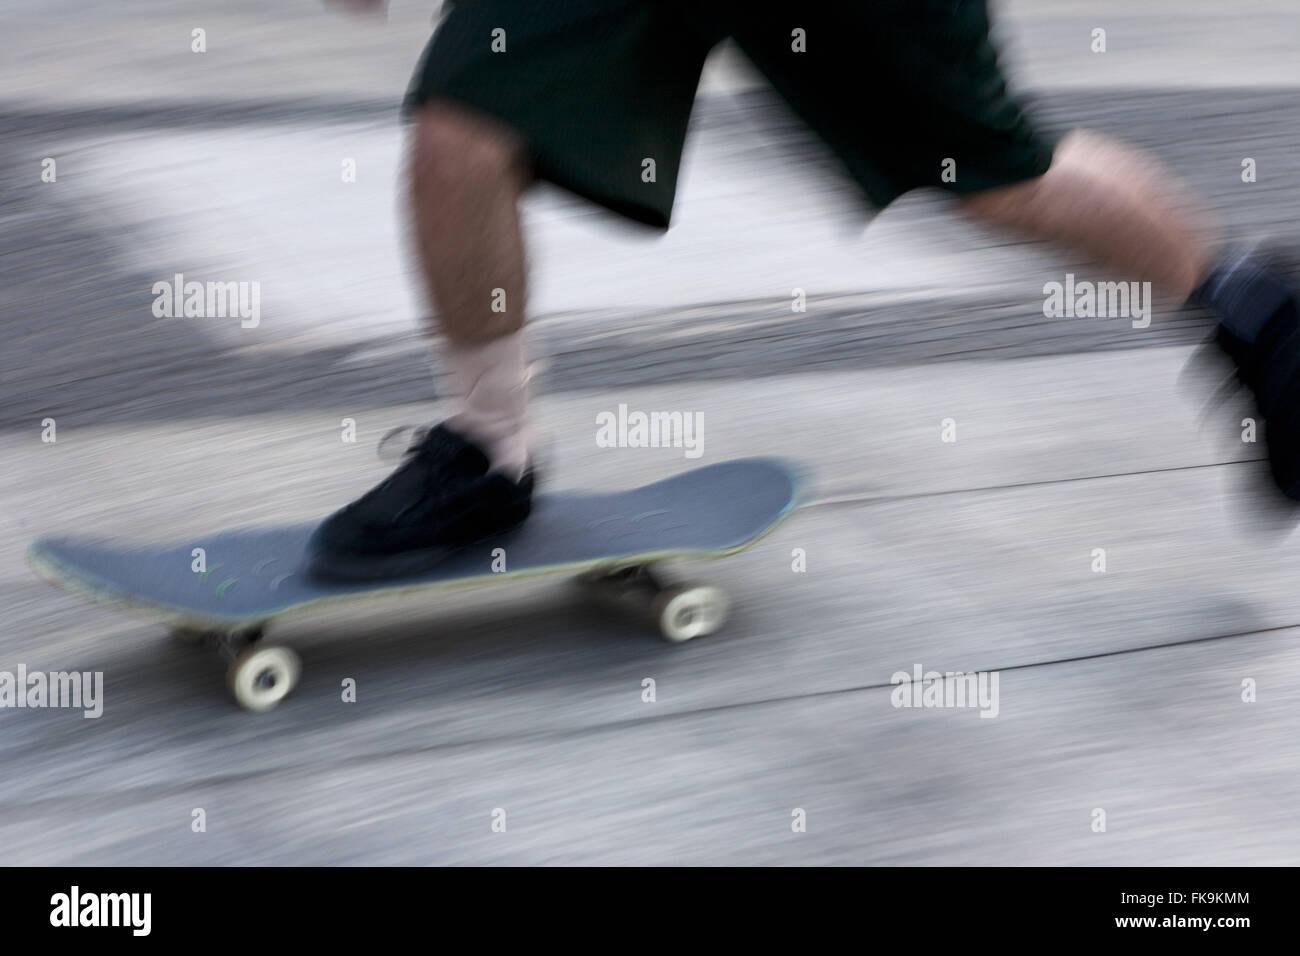 Detail of practical skateboard - Stock Image